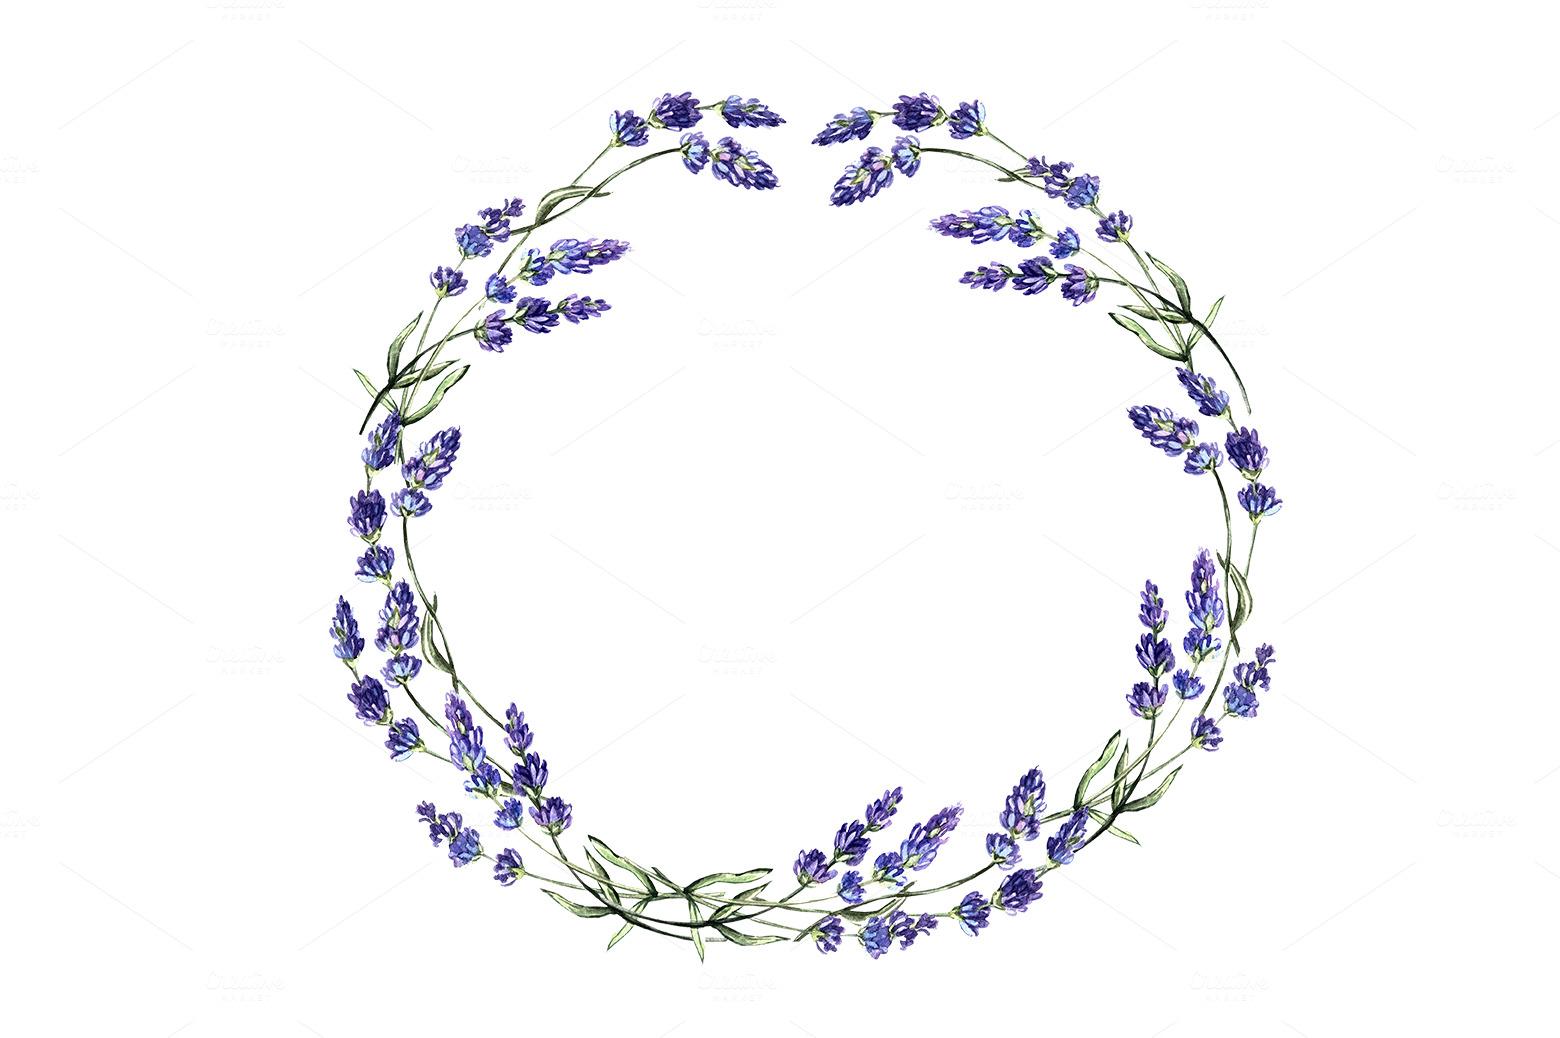 Vintage Lavender Illustration Wreath-with-lavender-flowers-m ...